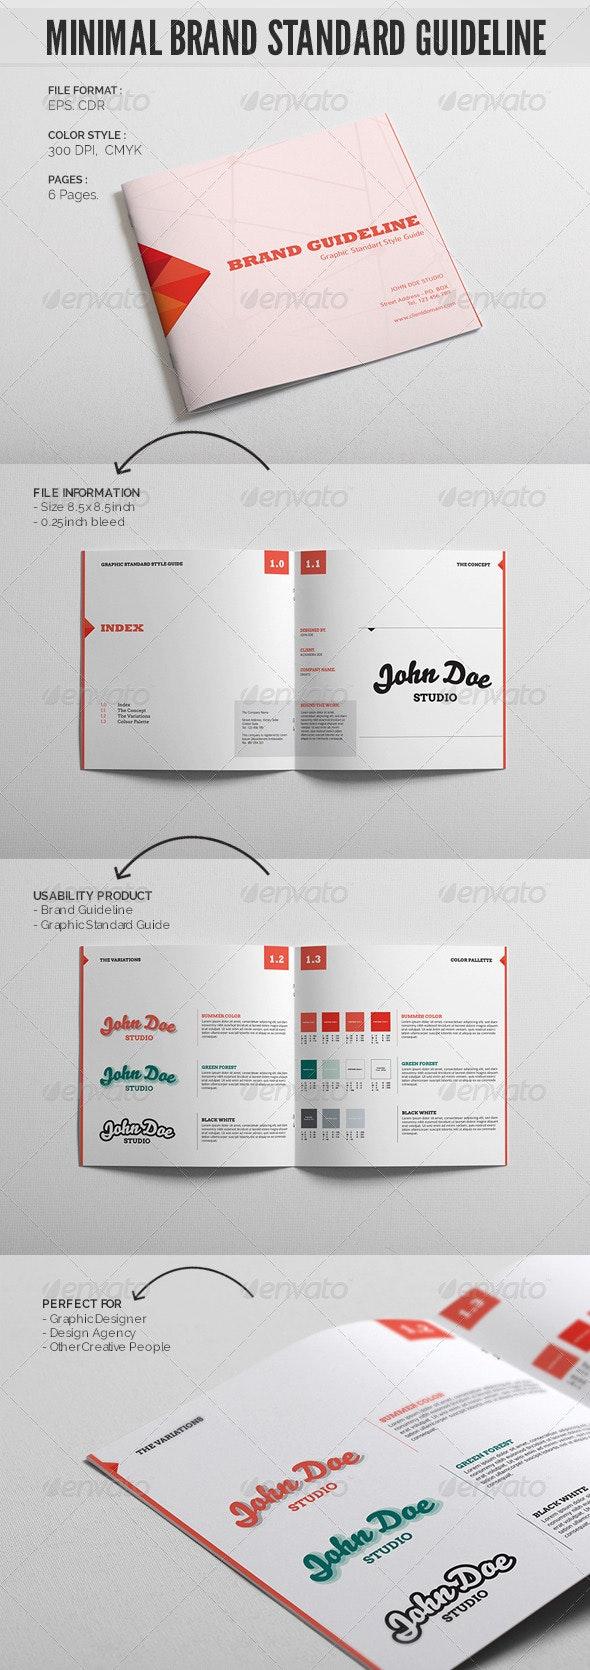 Minimal Brand Standard Guideline Template - Miscellaneous Print Templates